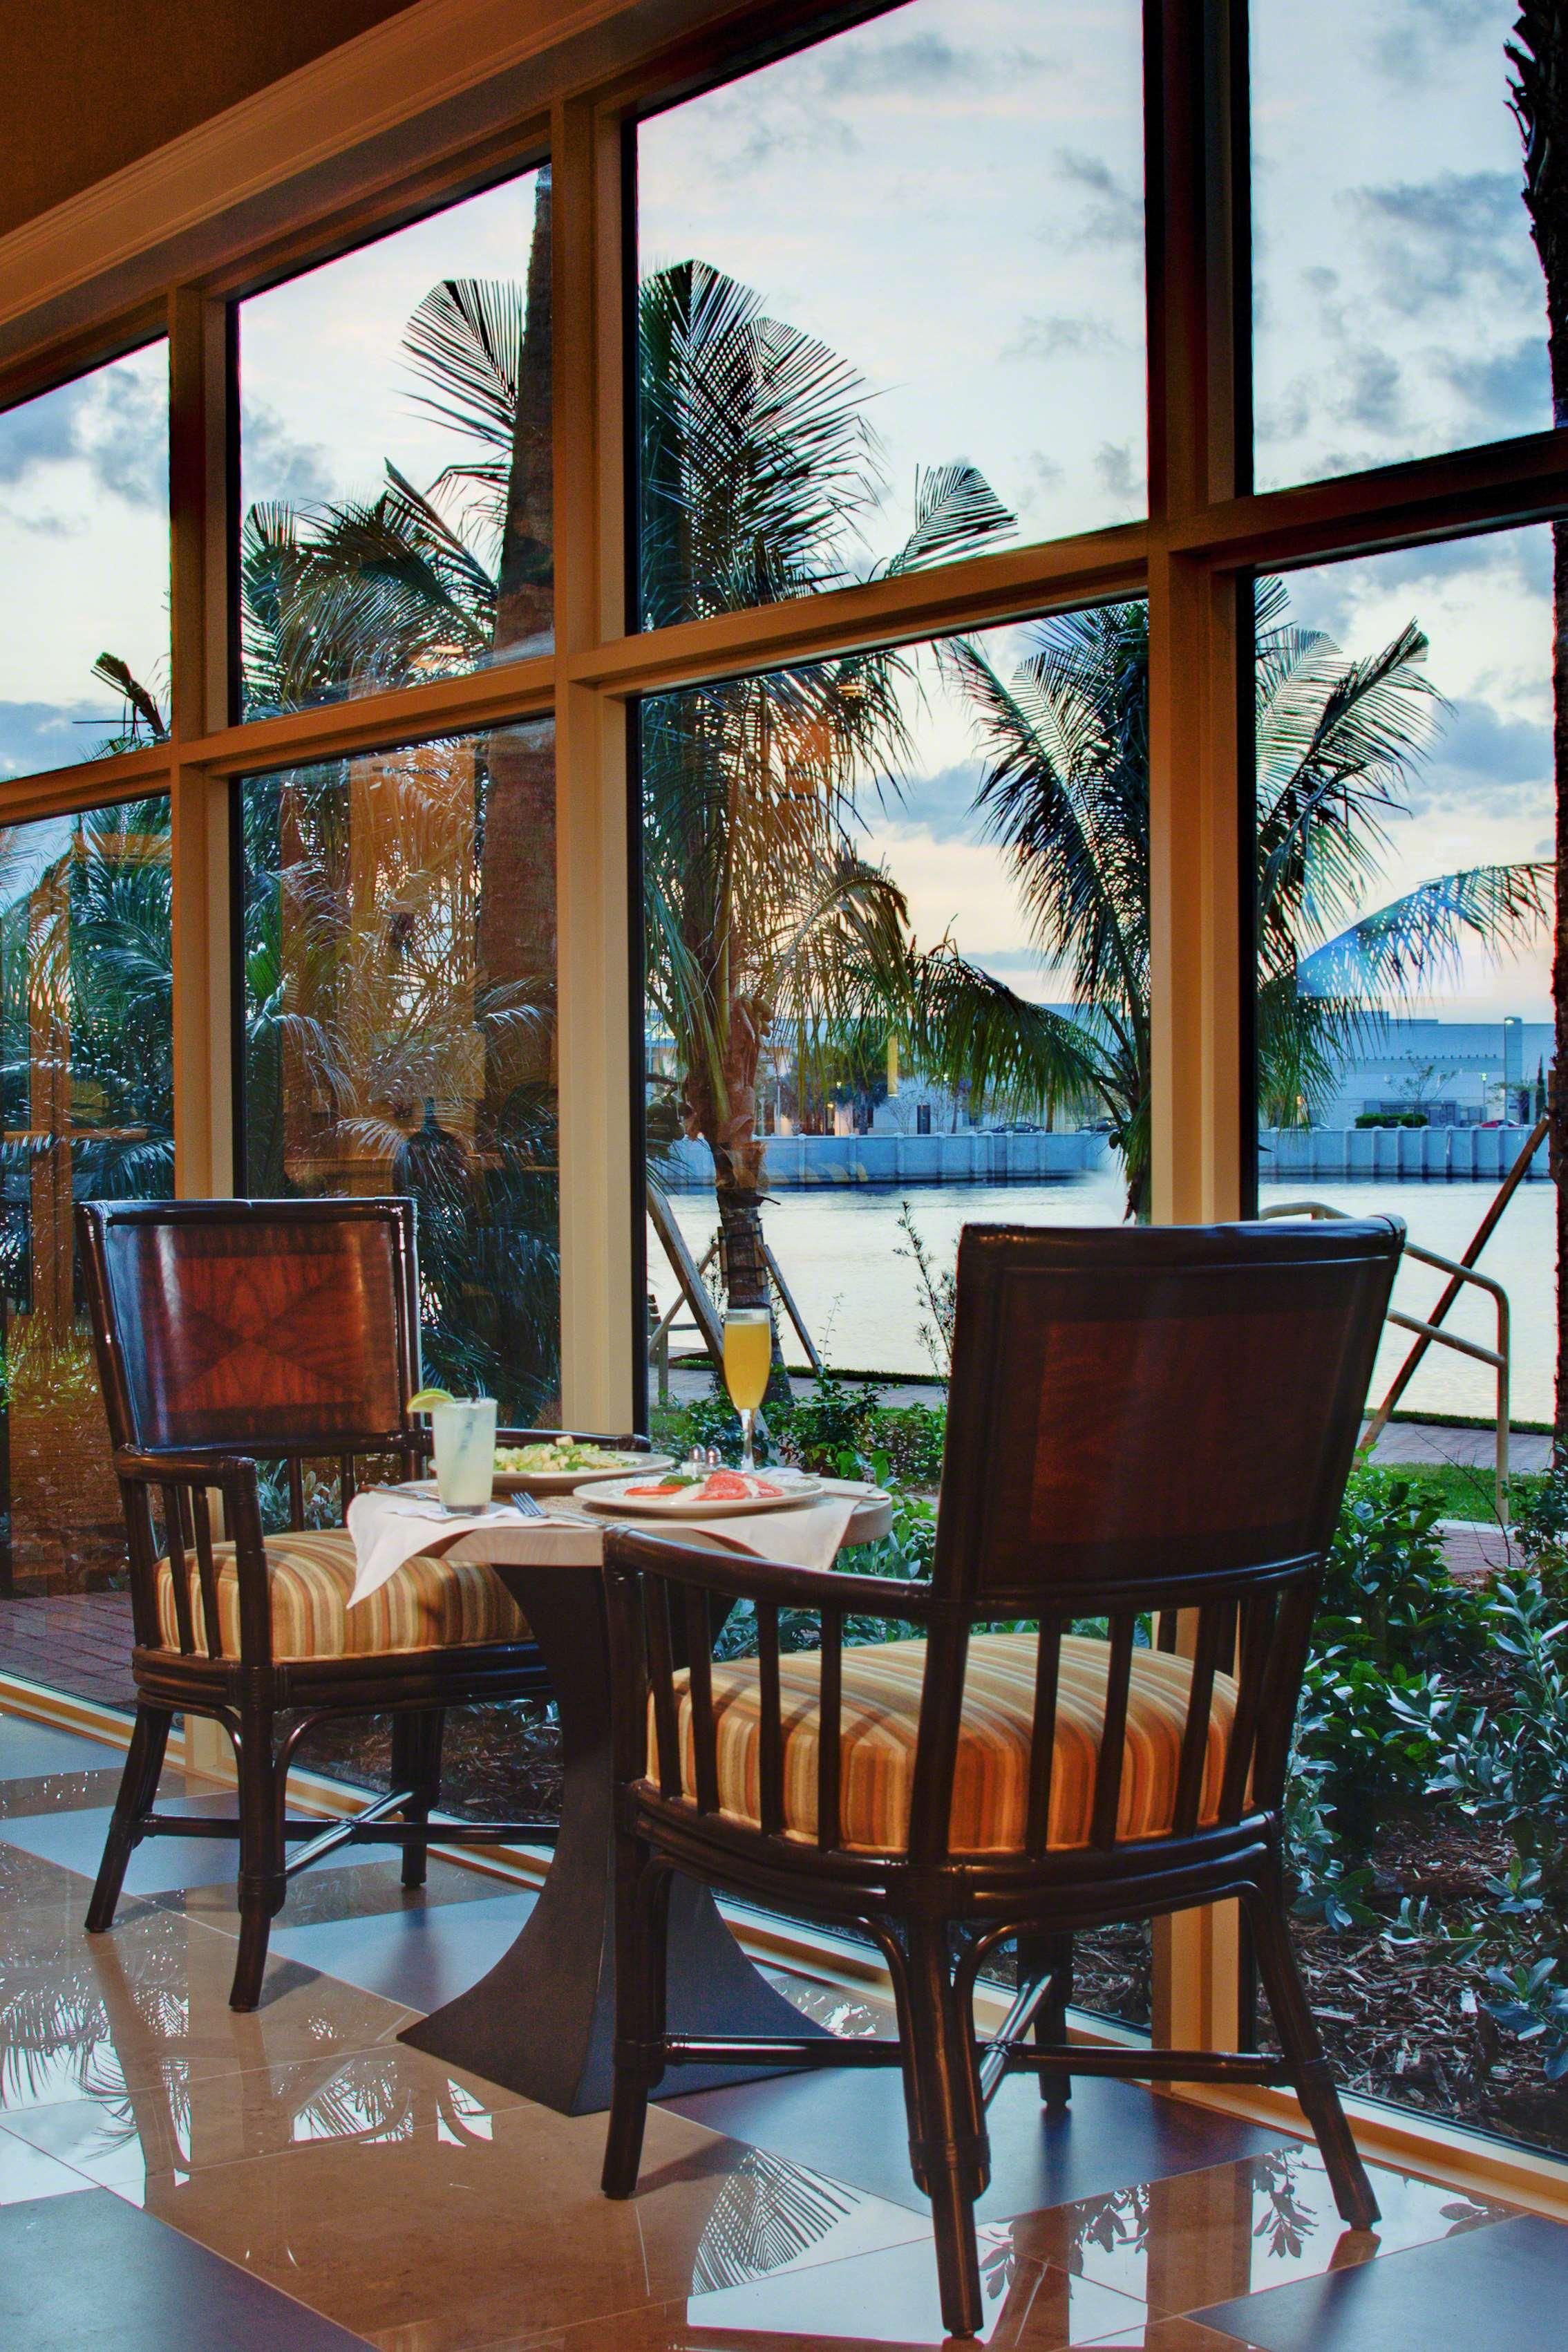 Hilton Garden Inn Palm Beach Gardens image 10